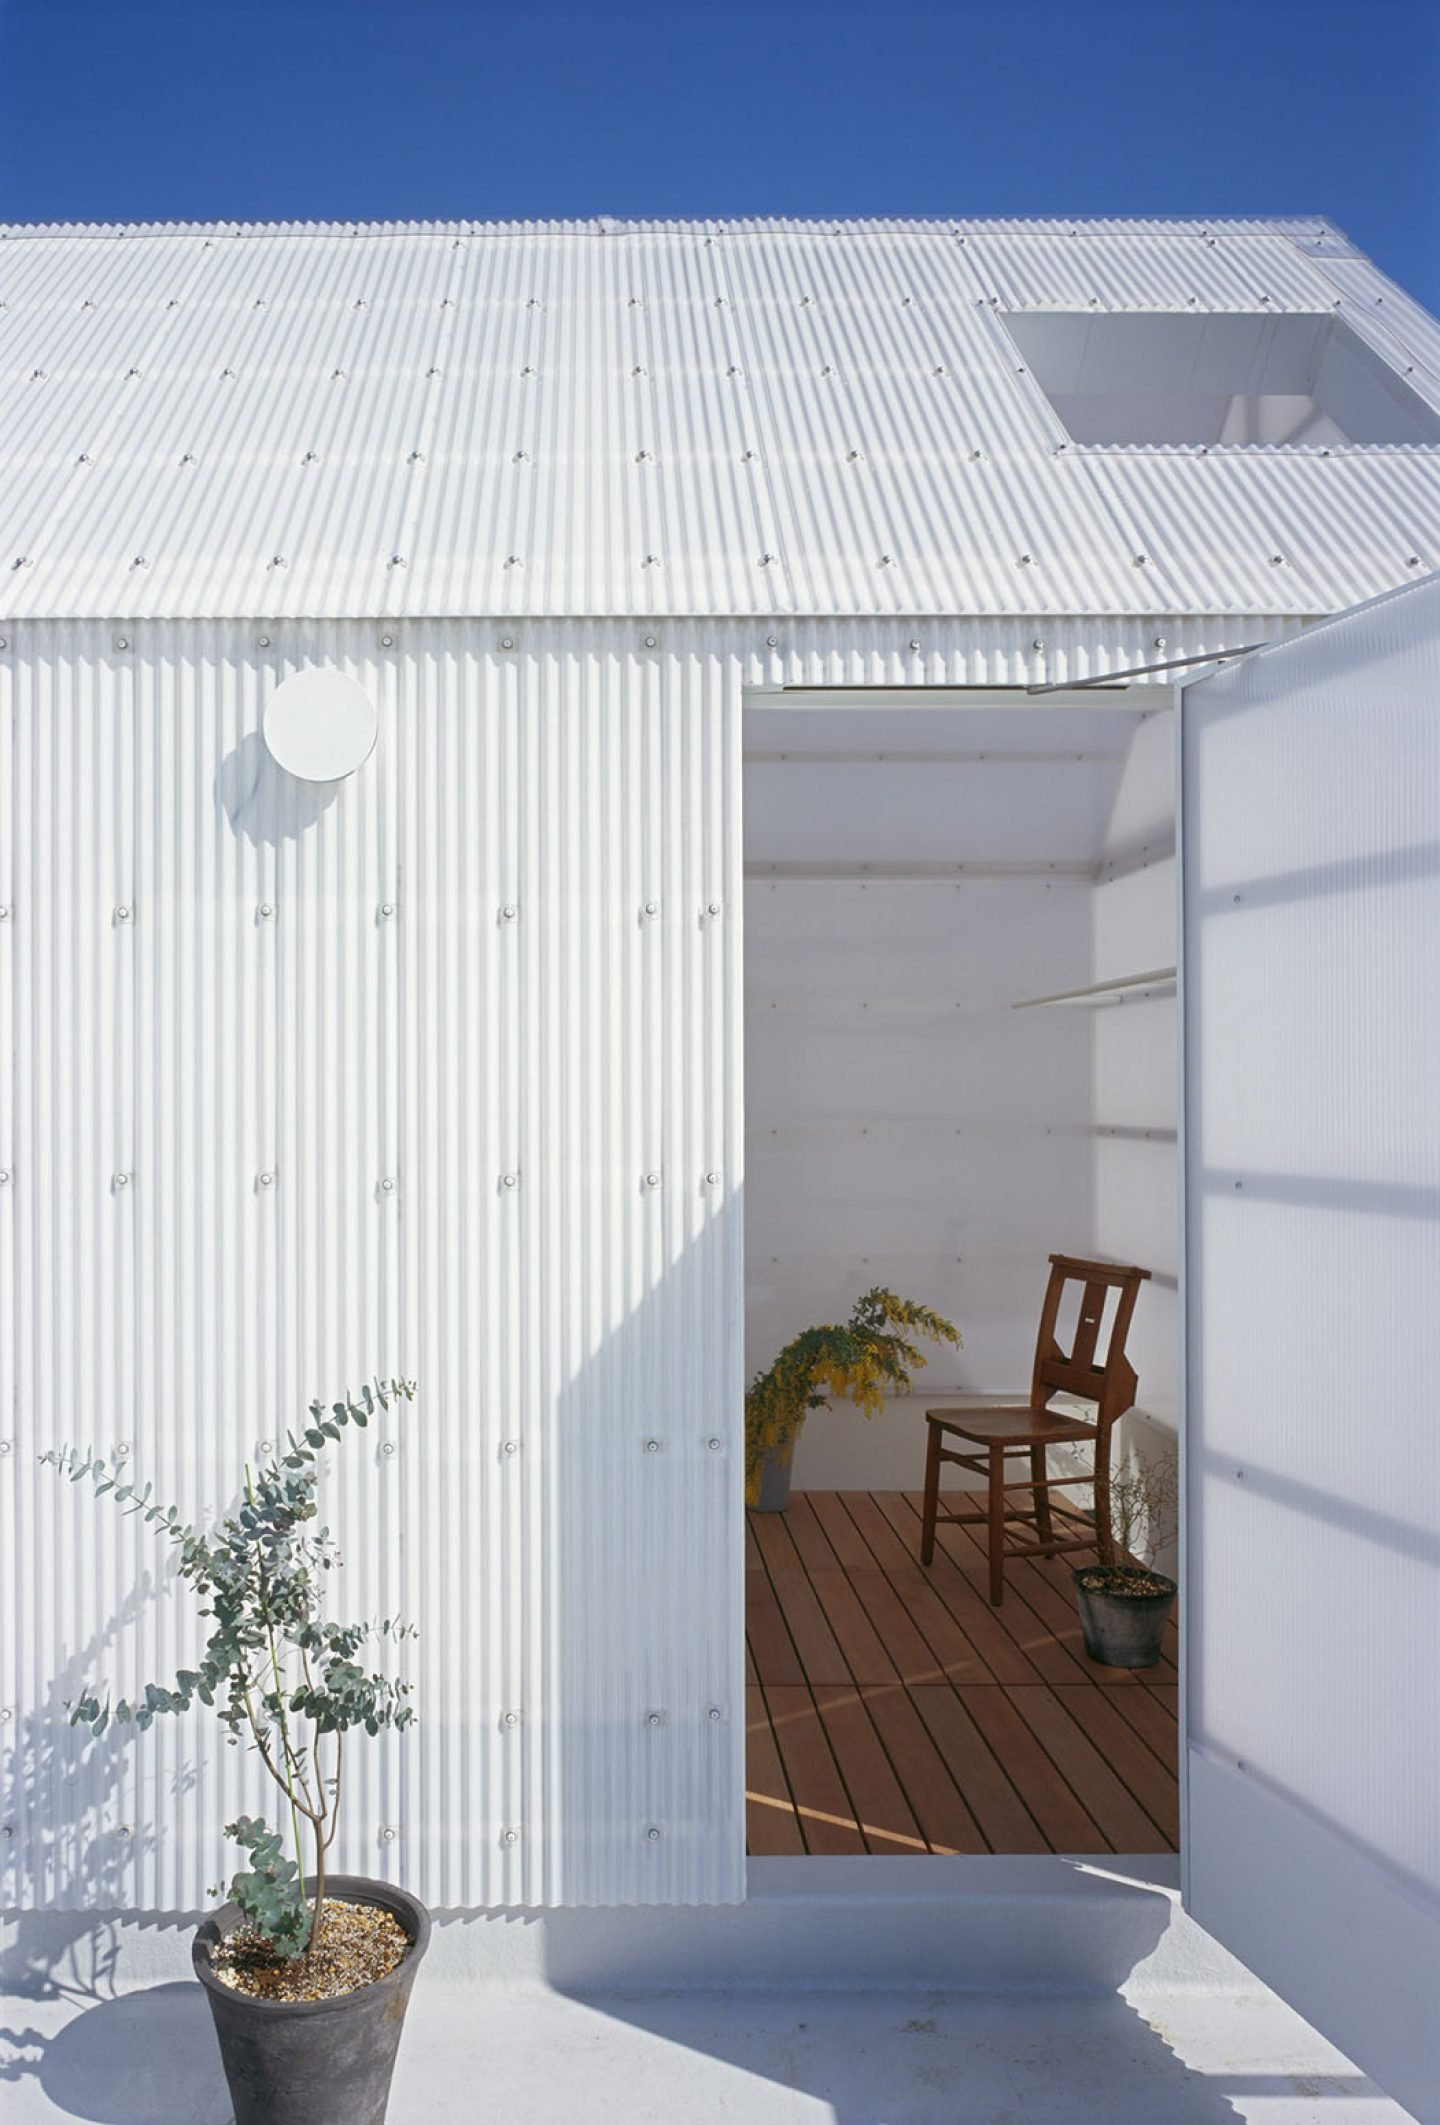 iGNANT_Architecture_Tato_Architects_Yo_Shimada_House_In_Yamasaki_9